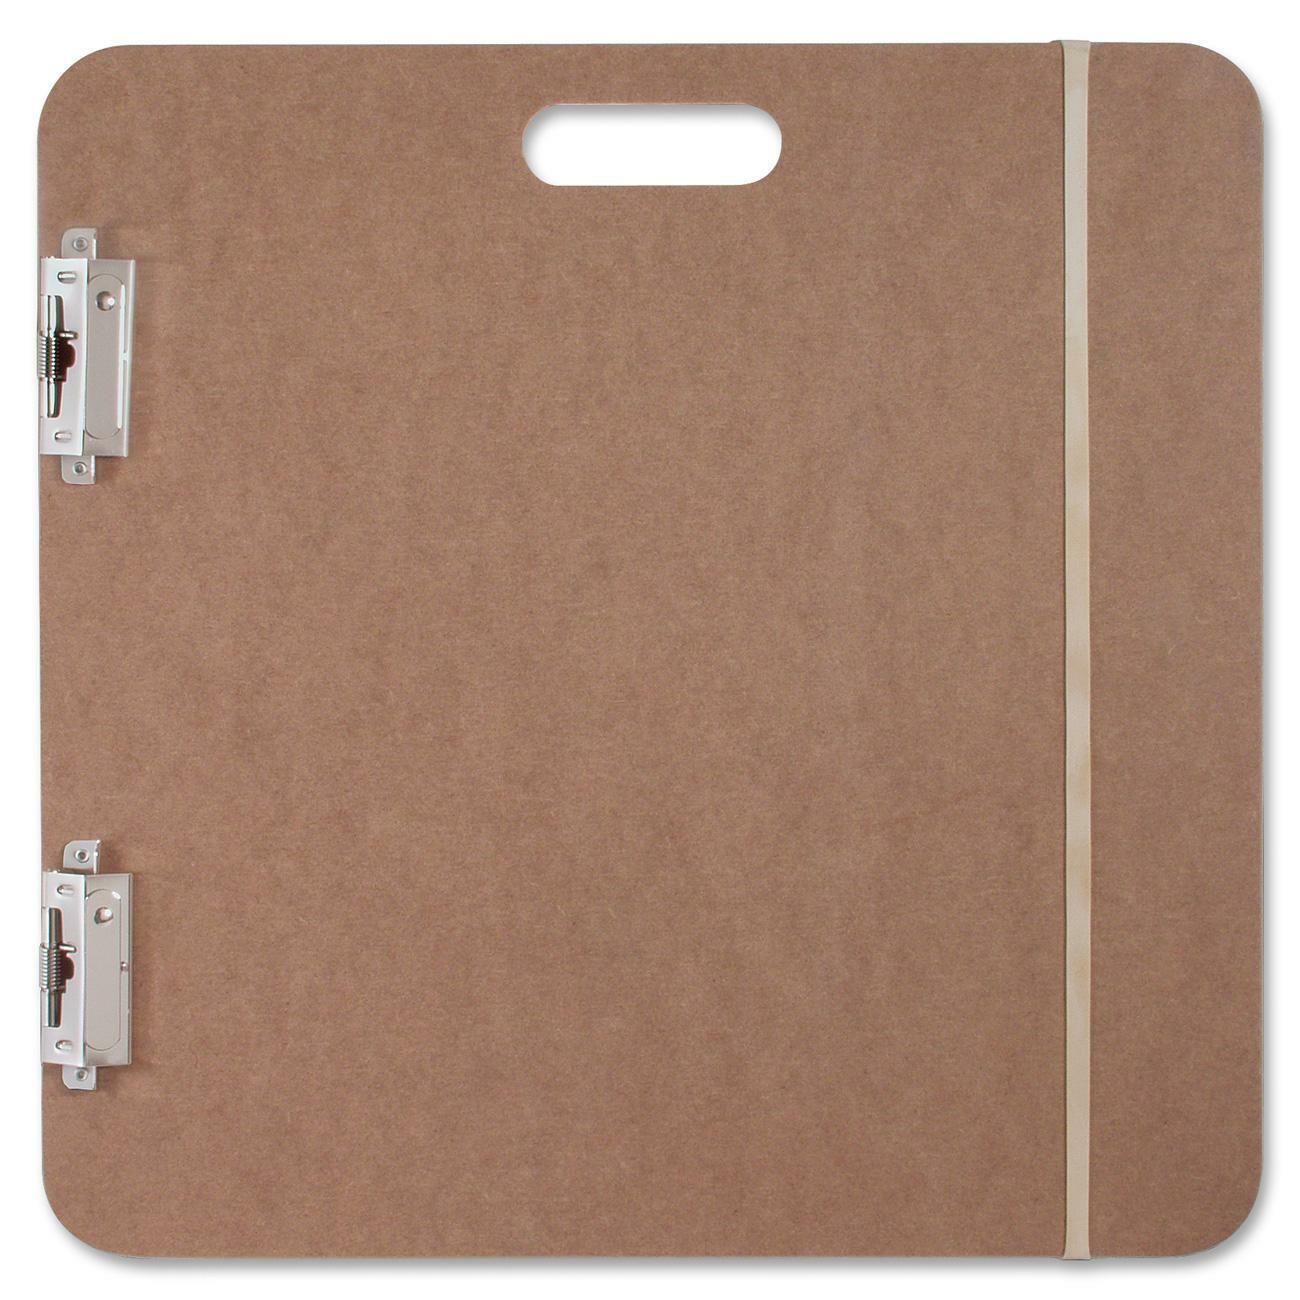 Soren Enterprises Inc. :: Office Supplies :: Boards & Easels